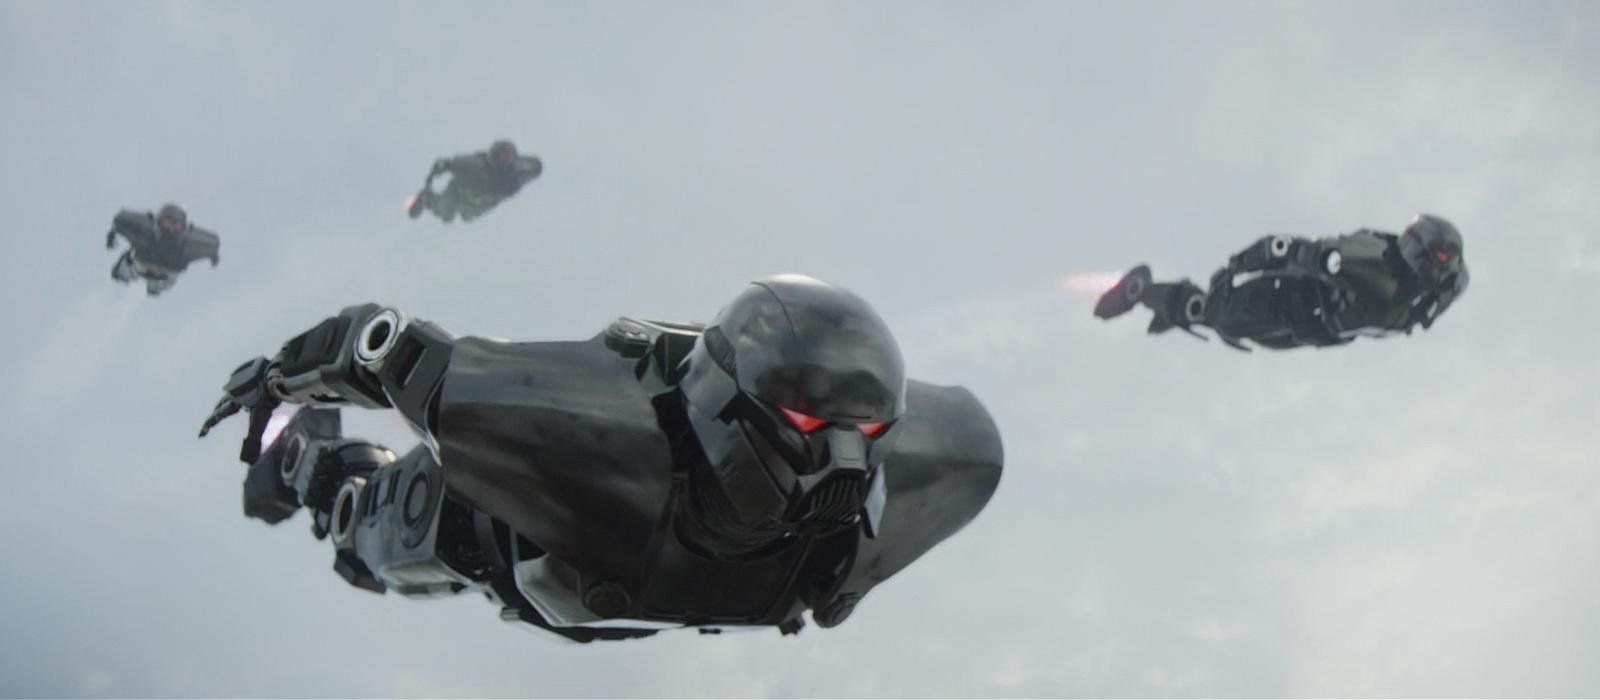 Dark trooper (Gideon's Imperial remnant)